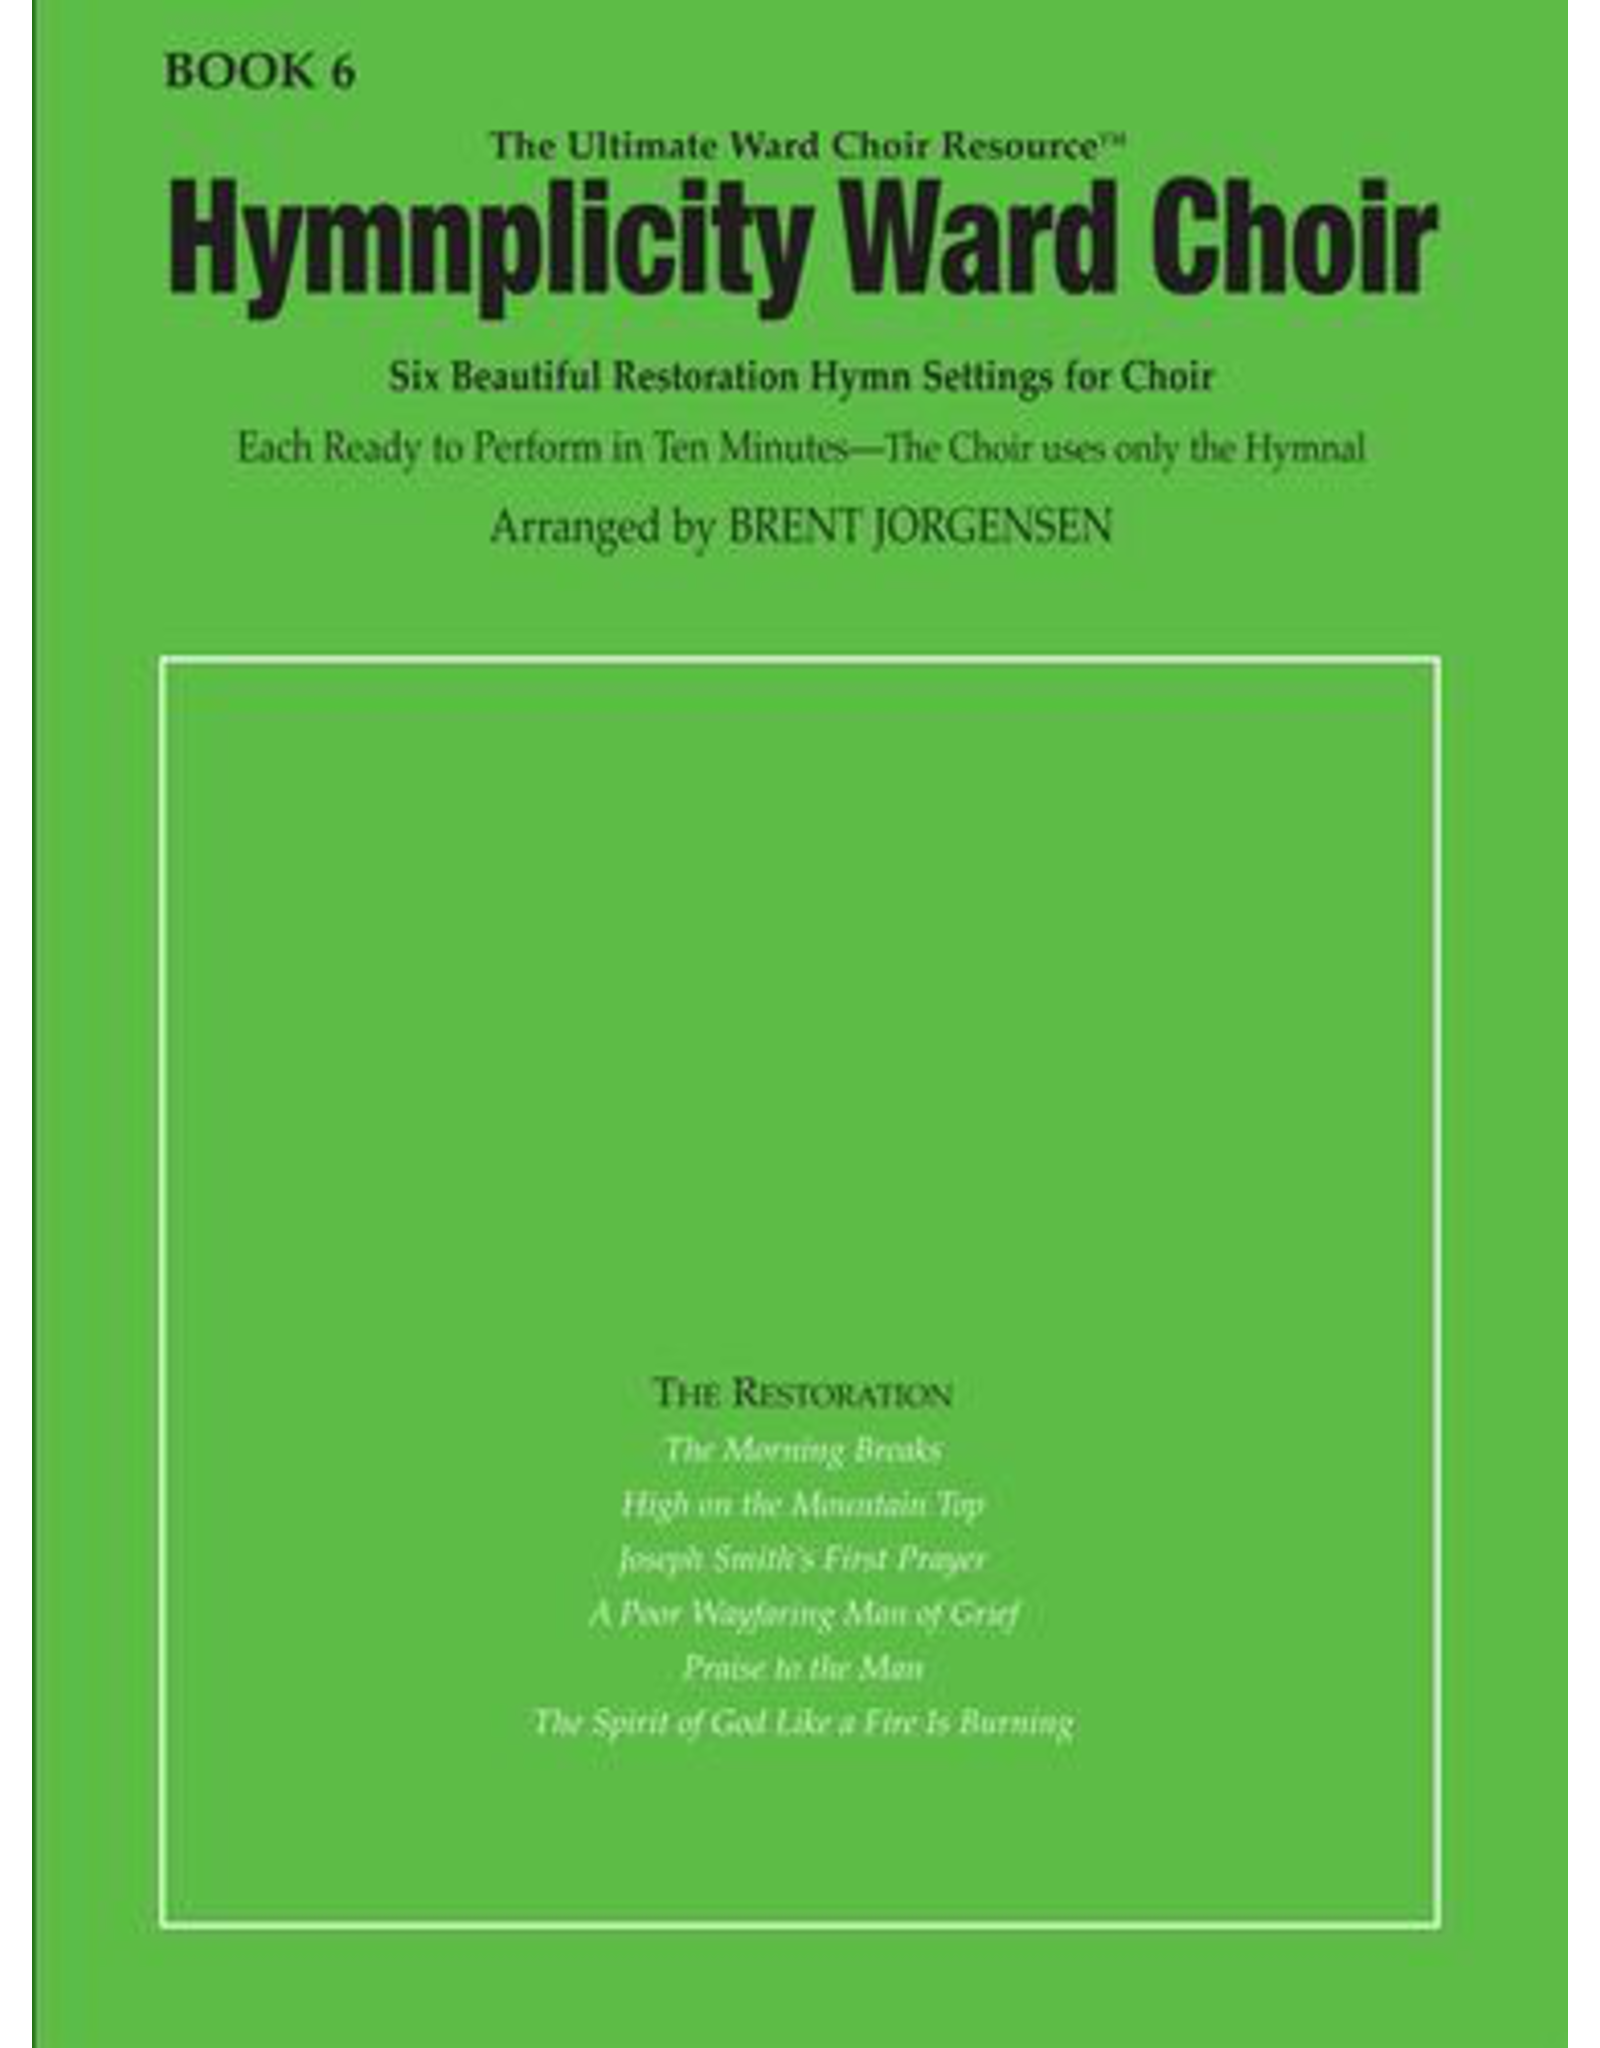 Jackman Music Hymnplicity Ward Choir Book 6